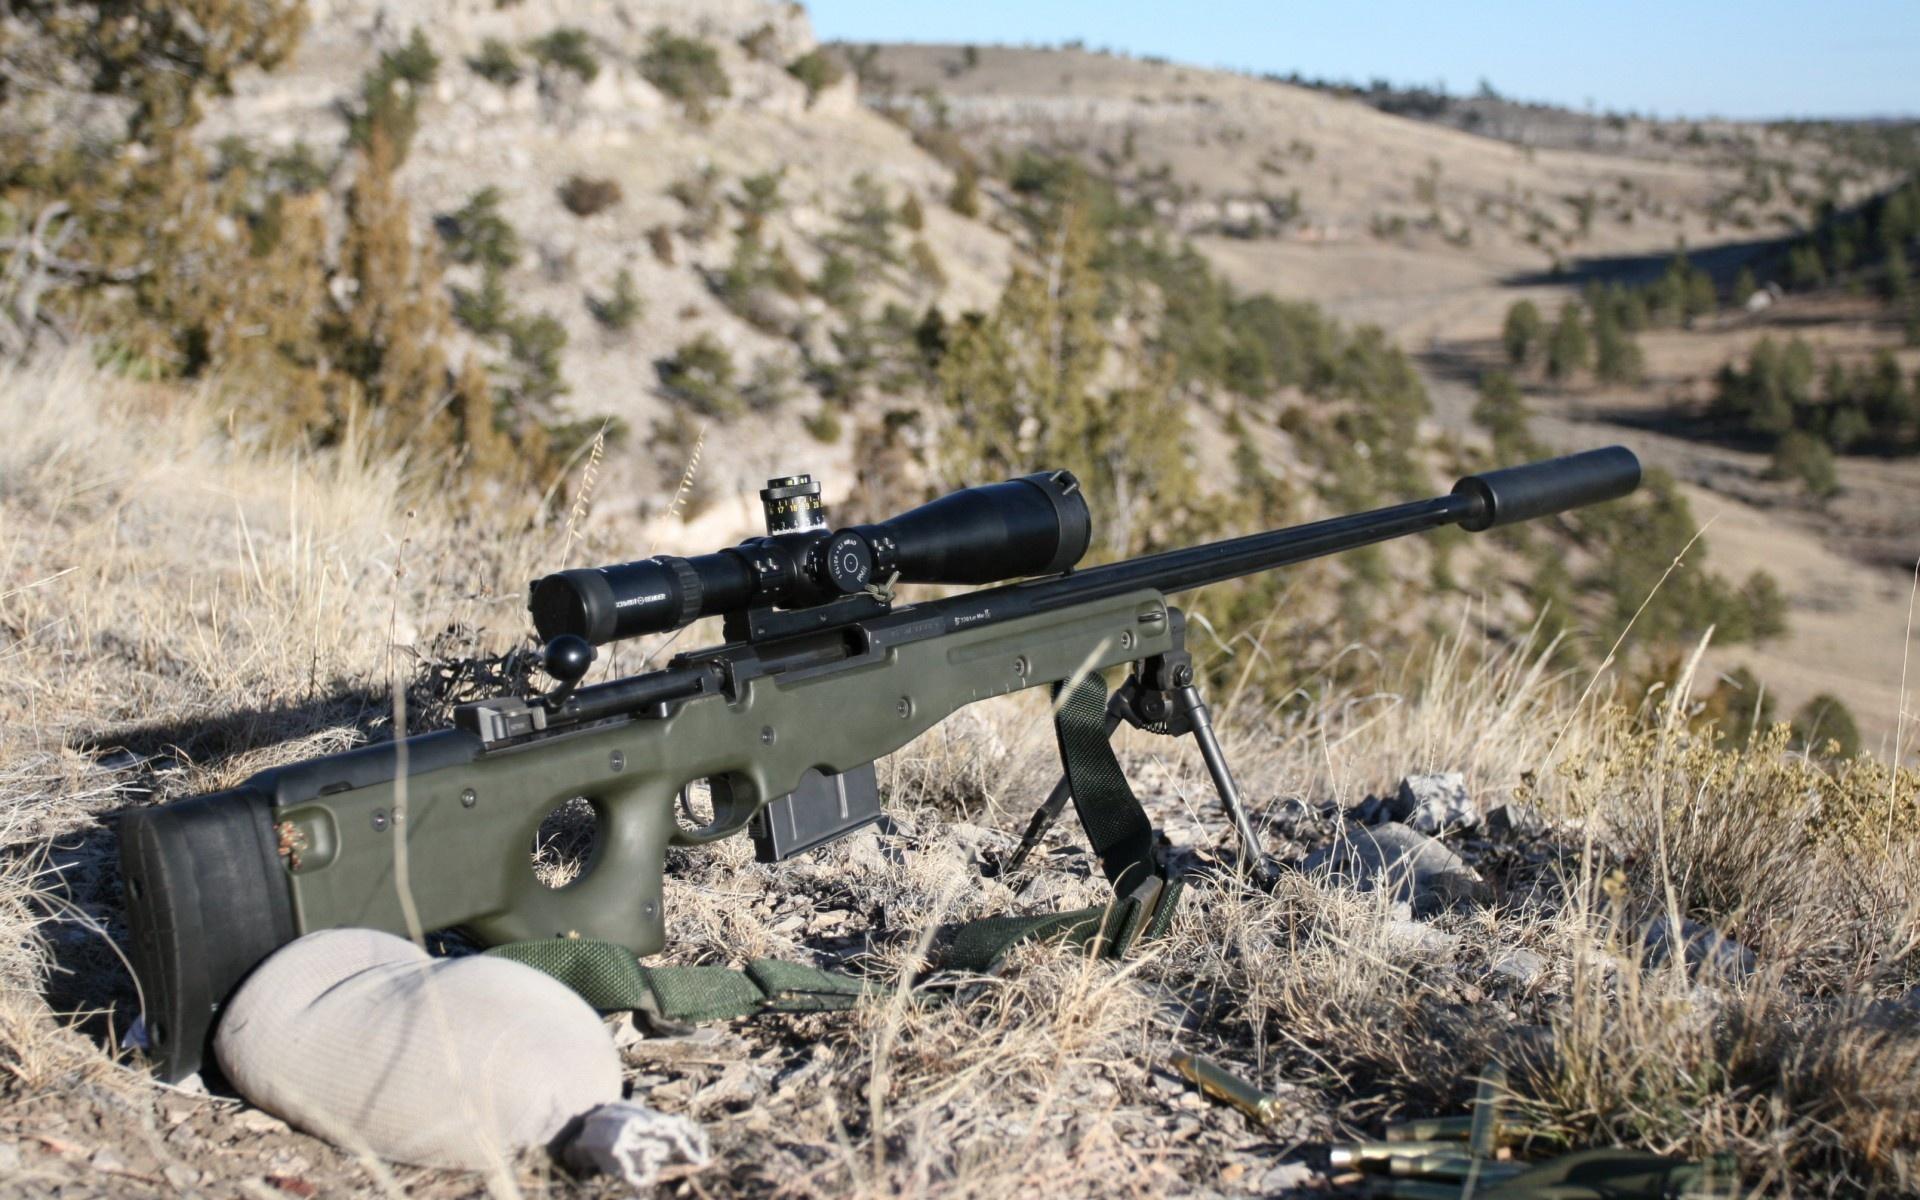 Deadly dragunov sniper rifle 1920 x 1200 download close